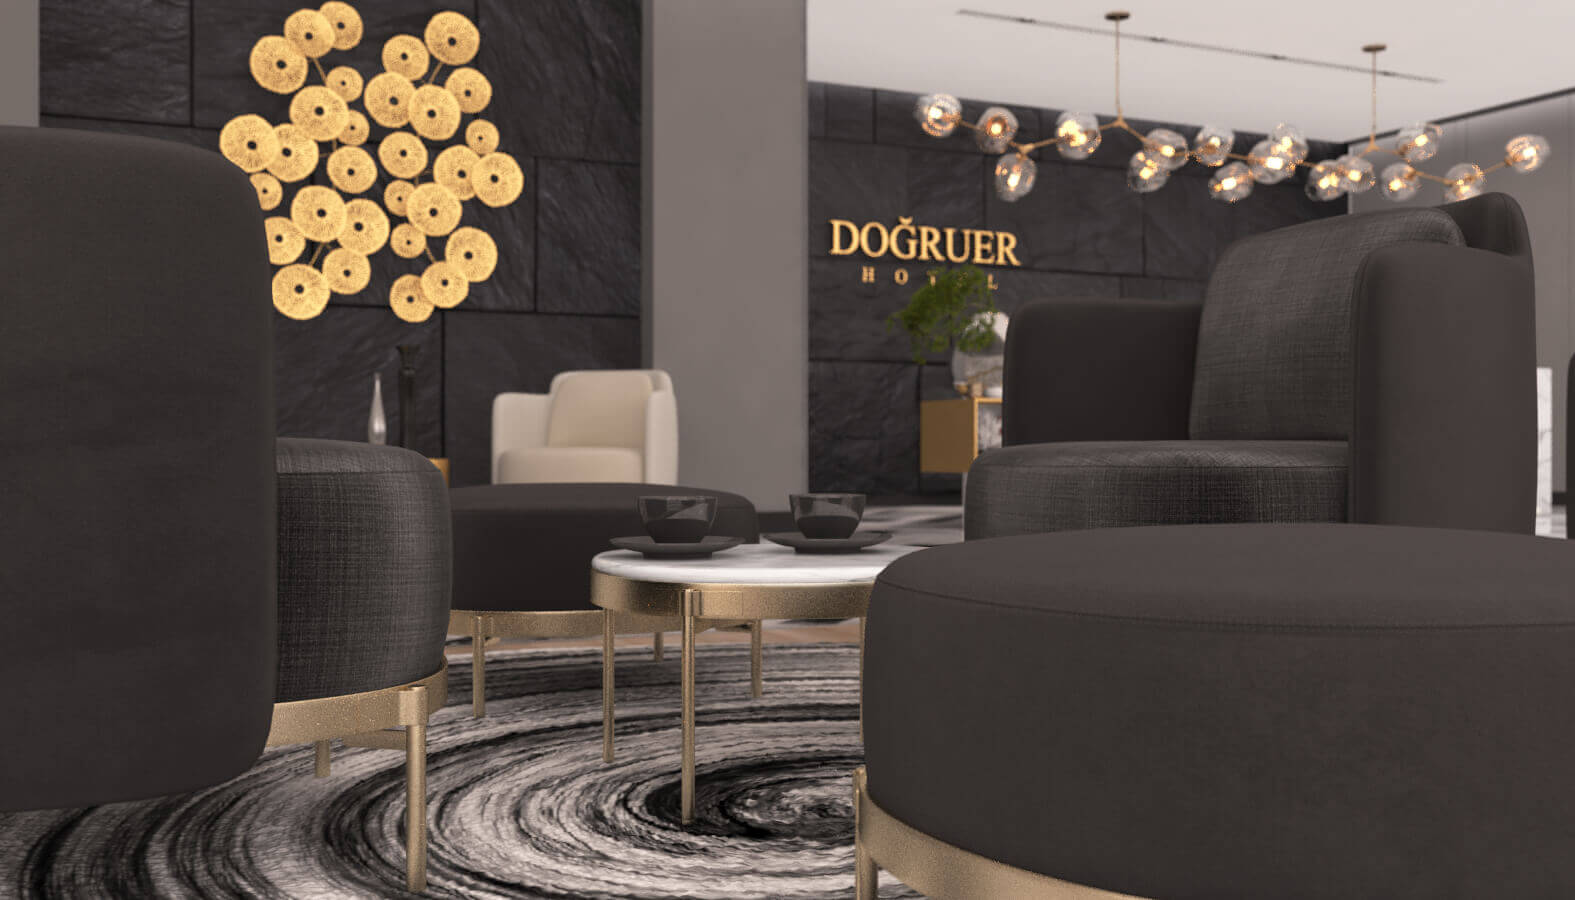 Hotel room 3590 Dogruer hotel Hotels